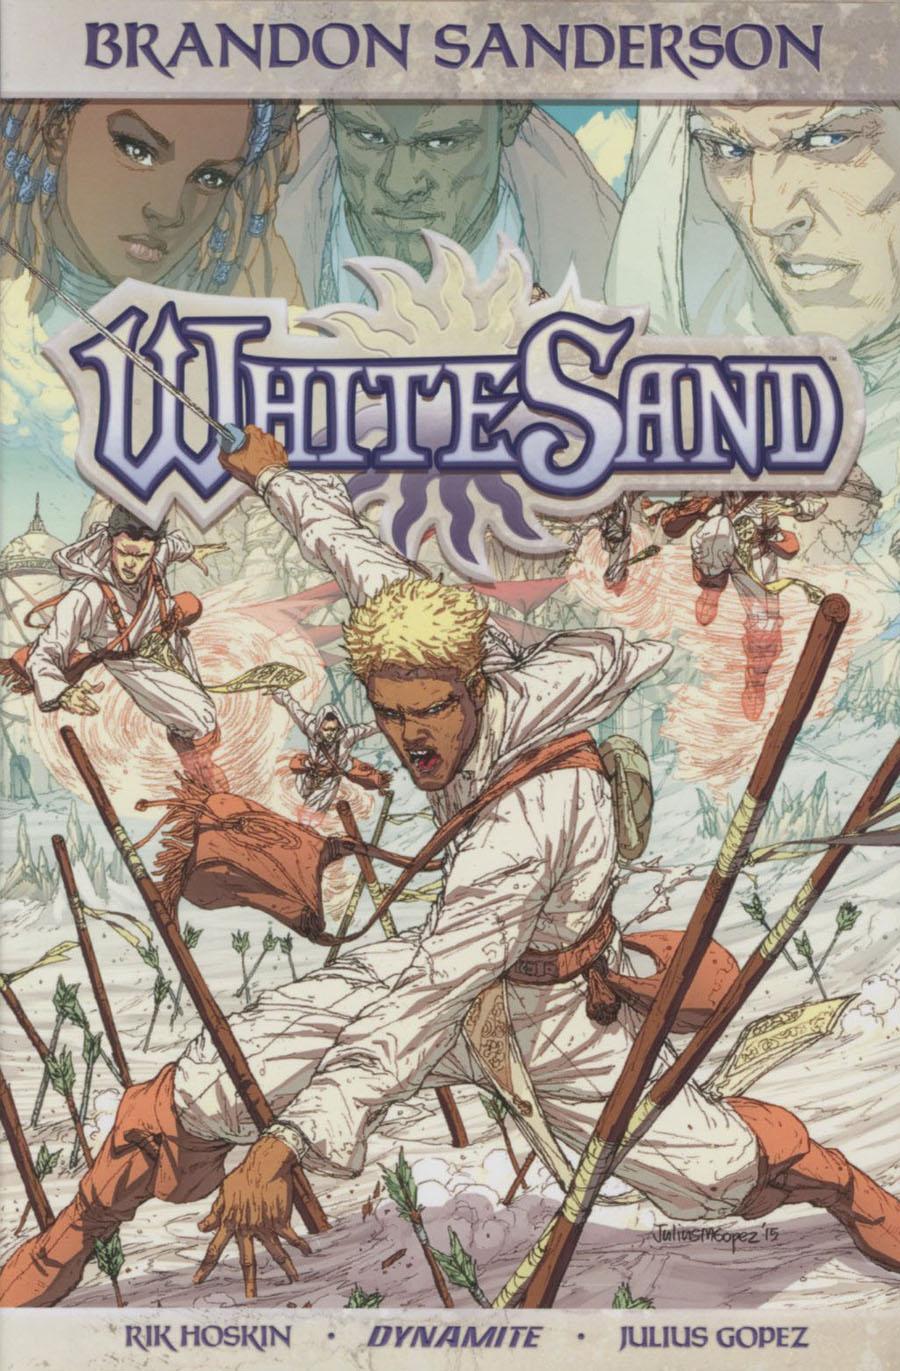 Brandon Sandersons White Sand Vol 1 HC Regular Edition